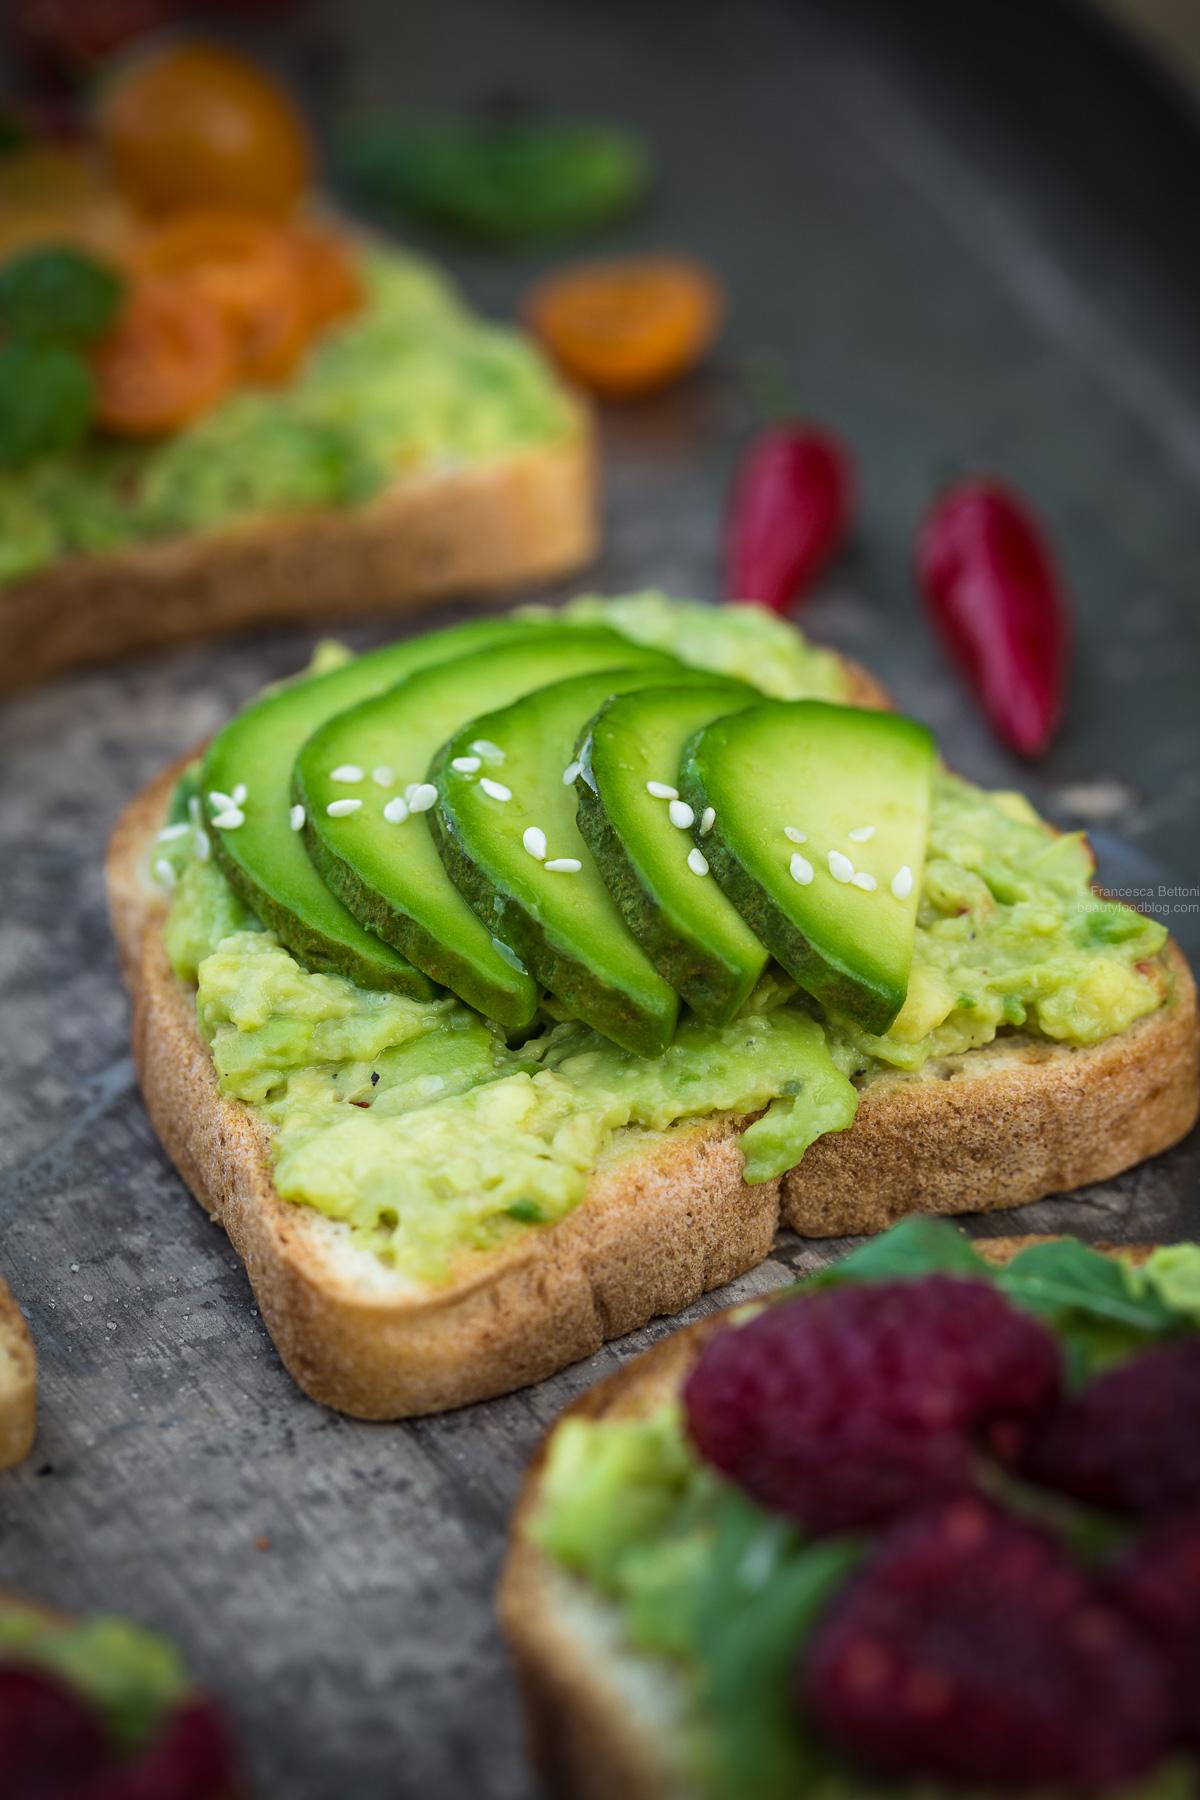 vegan glutenfree avocado toast recipe with sesame seeds ricetta avocado toast vegan senza glutine